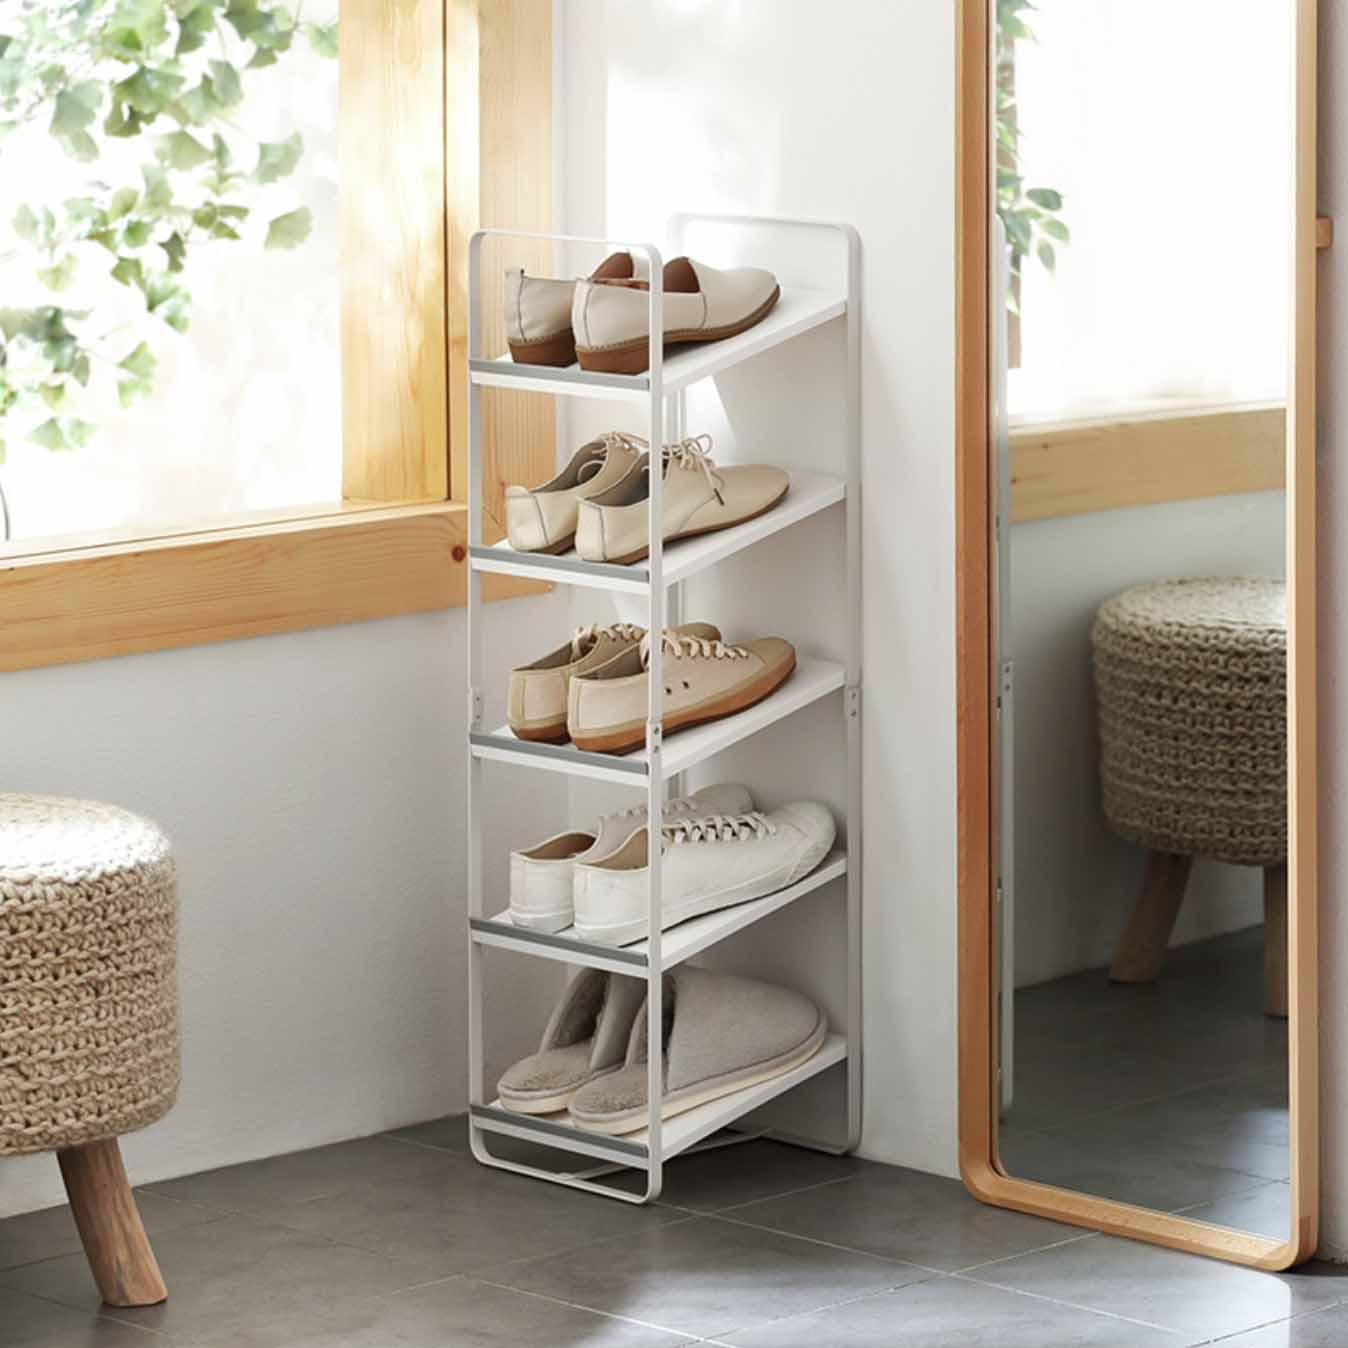 39386e8582baf1 Ascend Shoe Rack (Slim Design) Racks Organizer Footwear Organiser Storage  Slippers Style Degree Sg